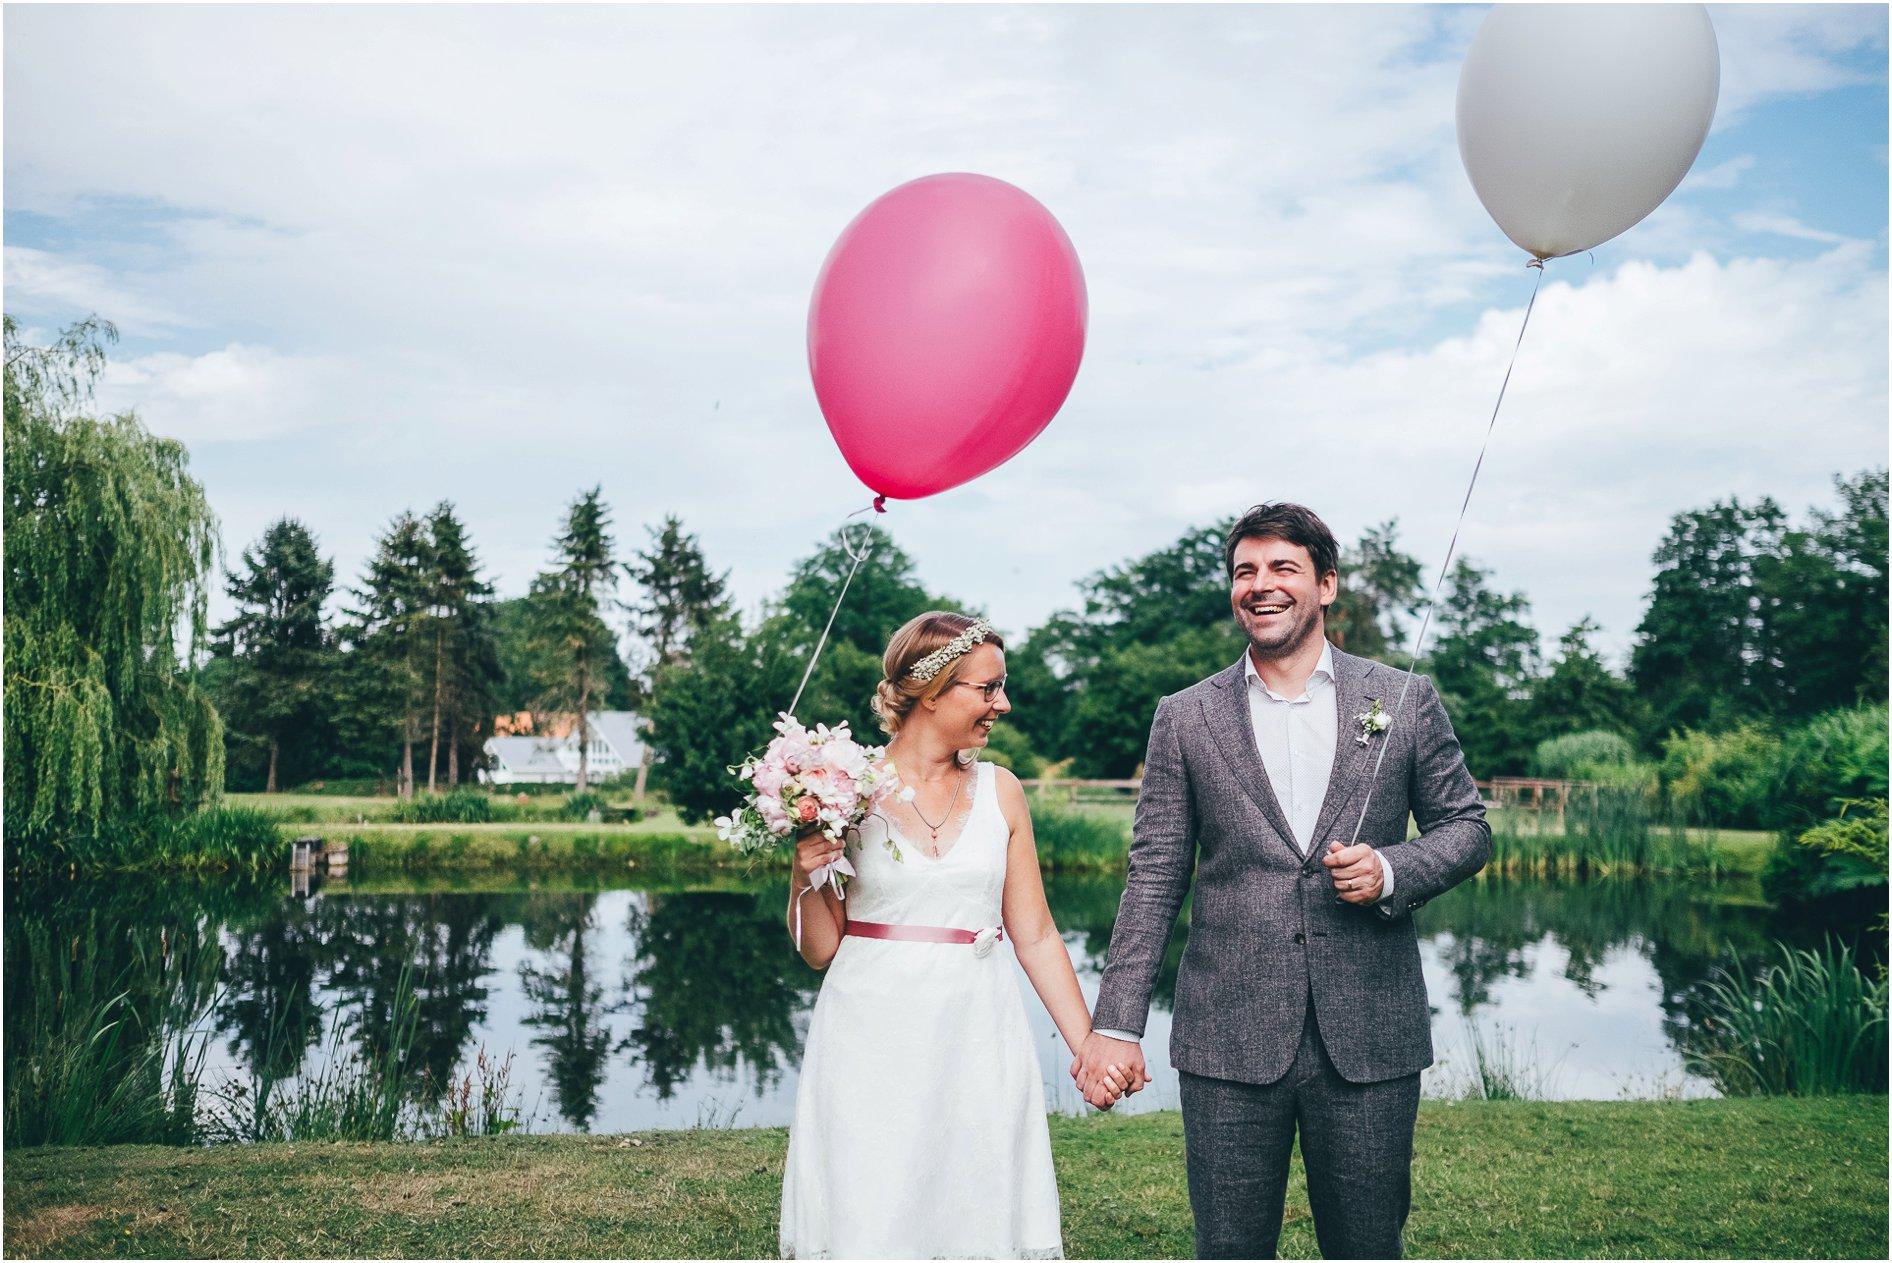 2016-04-19_0058 Sandra & Janis - Hochzeitsfotograf in Seevetal